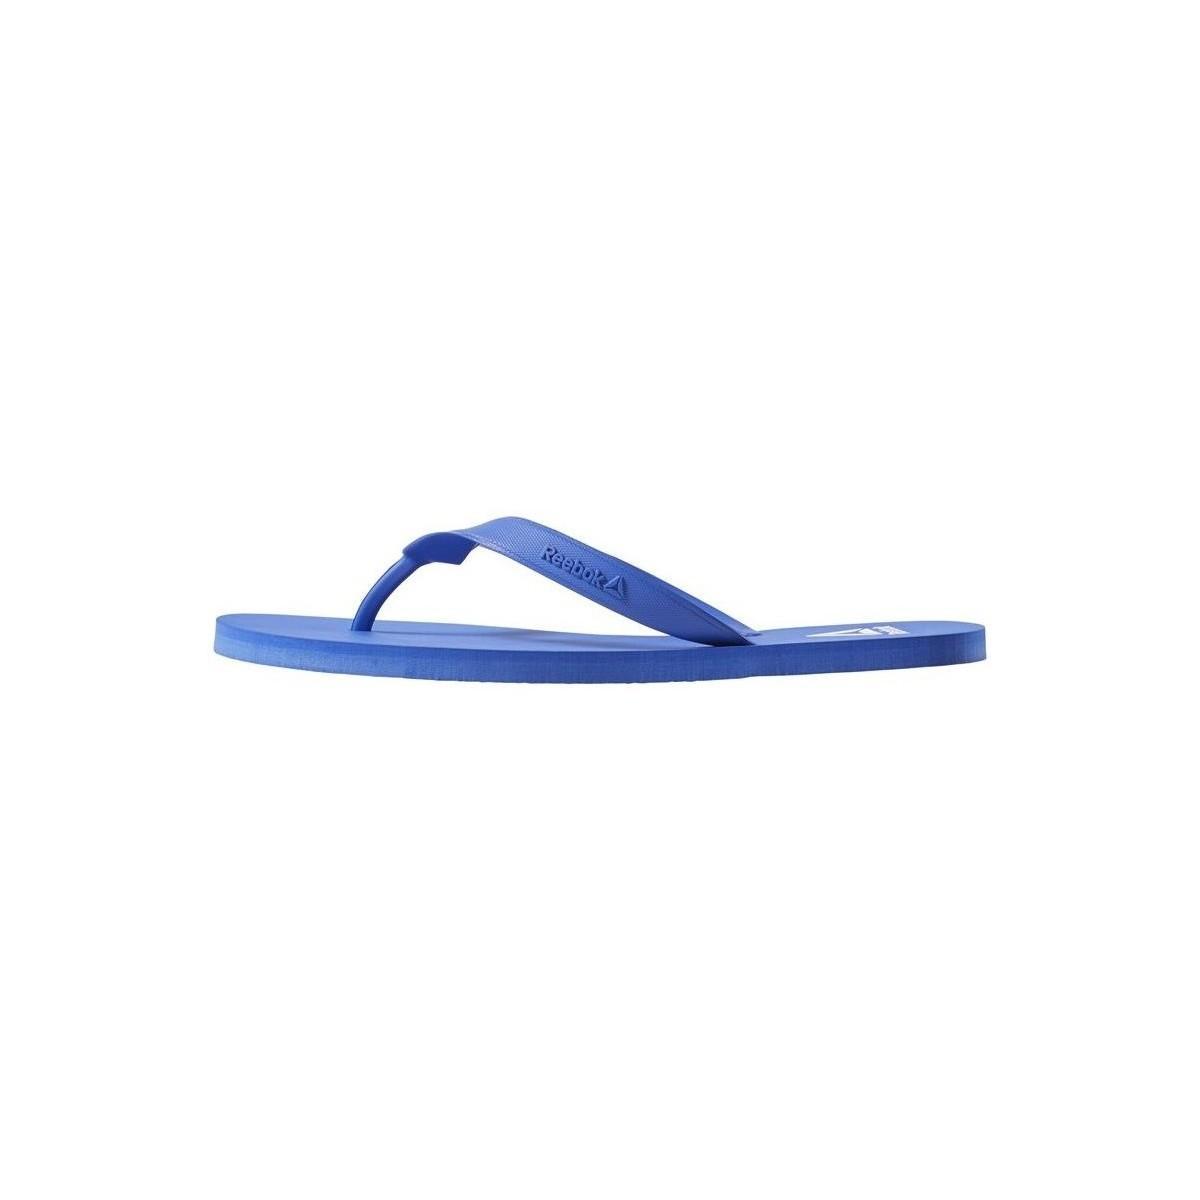 8cadc94132c9 Reebok - Cash Flip Men s Flip Flops   Sandals (shoes) In Blue for Men. View  fullscreen